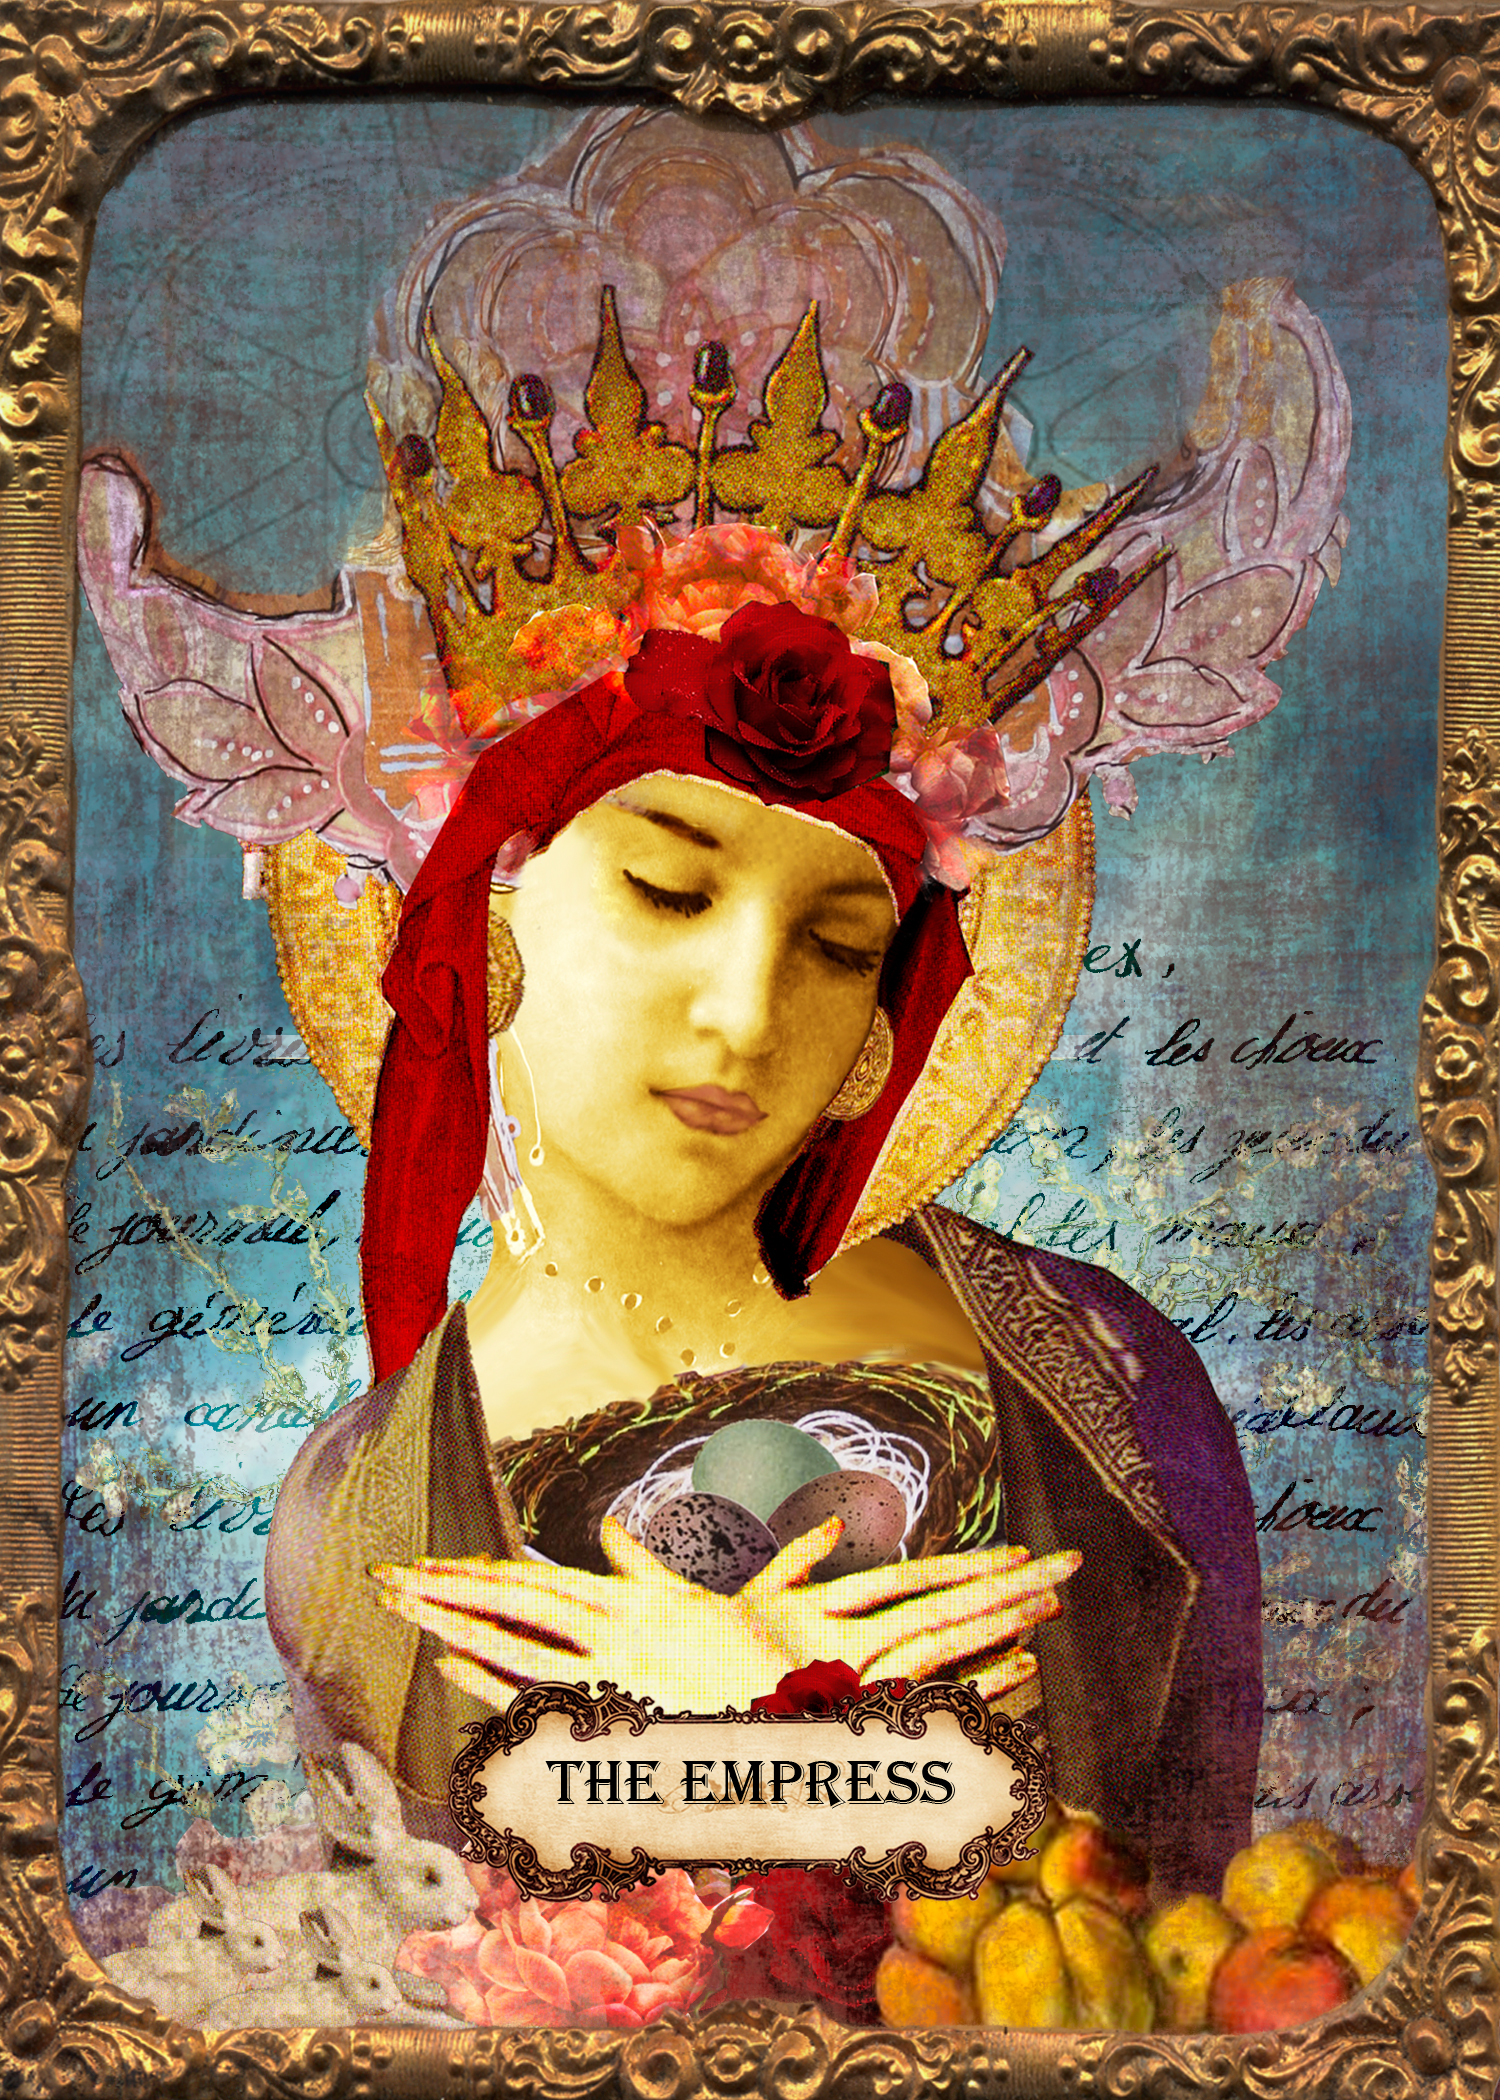 Andrea Matus deMeng -The Empress III.jpg